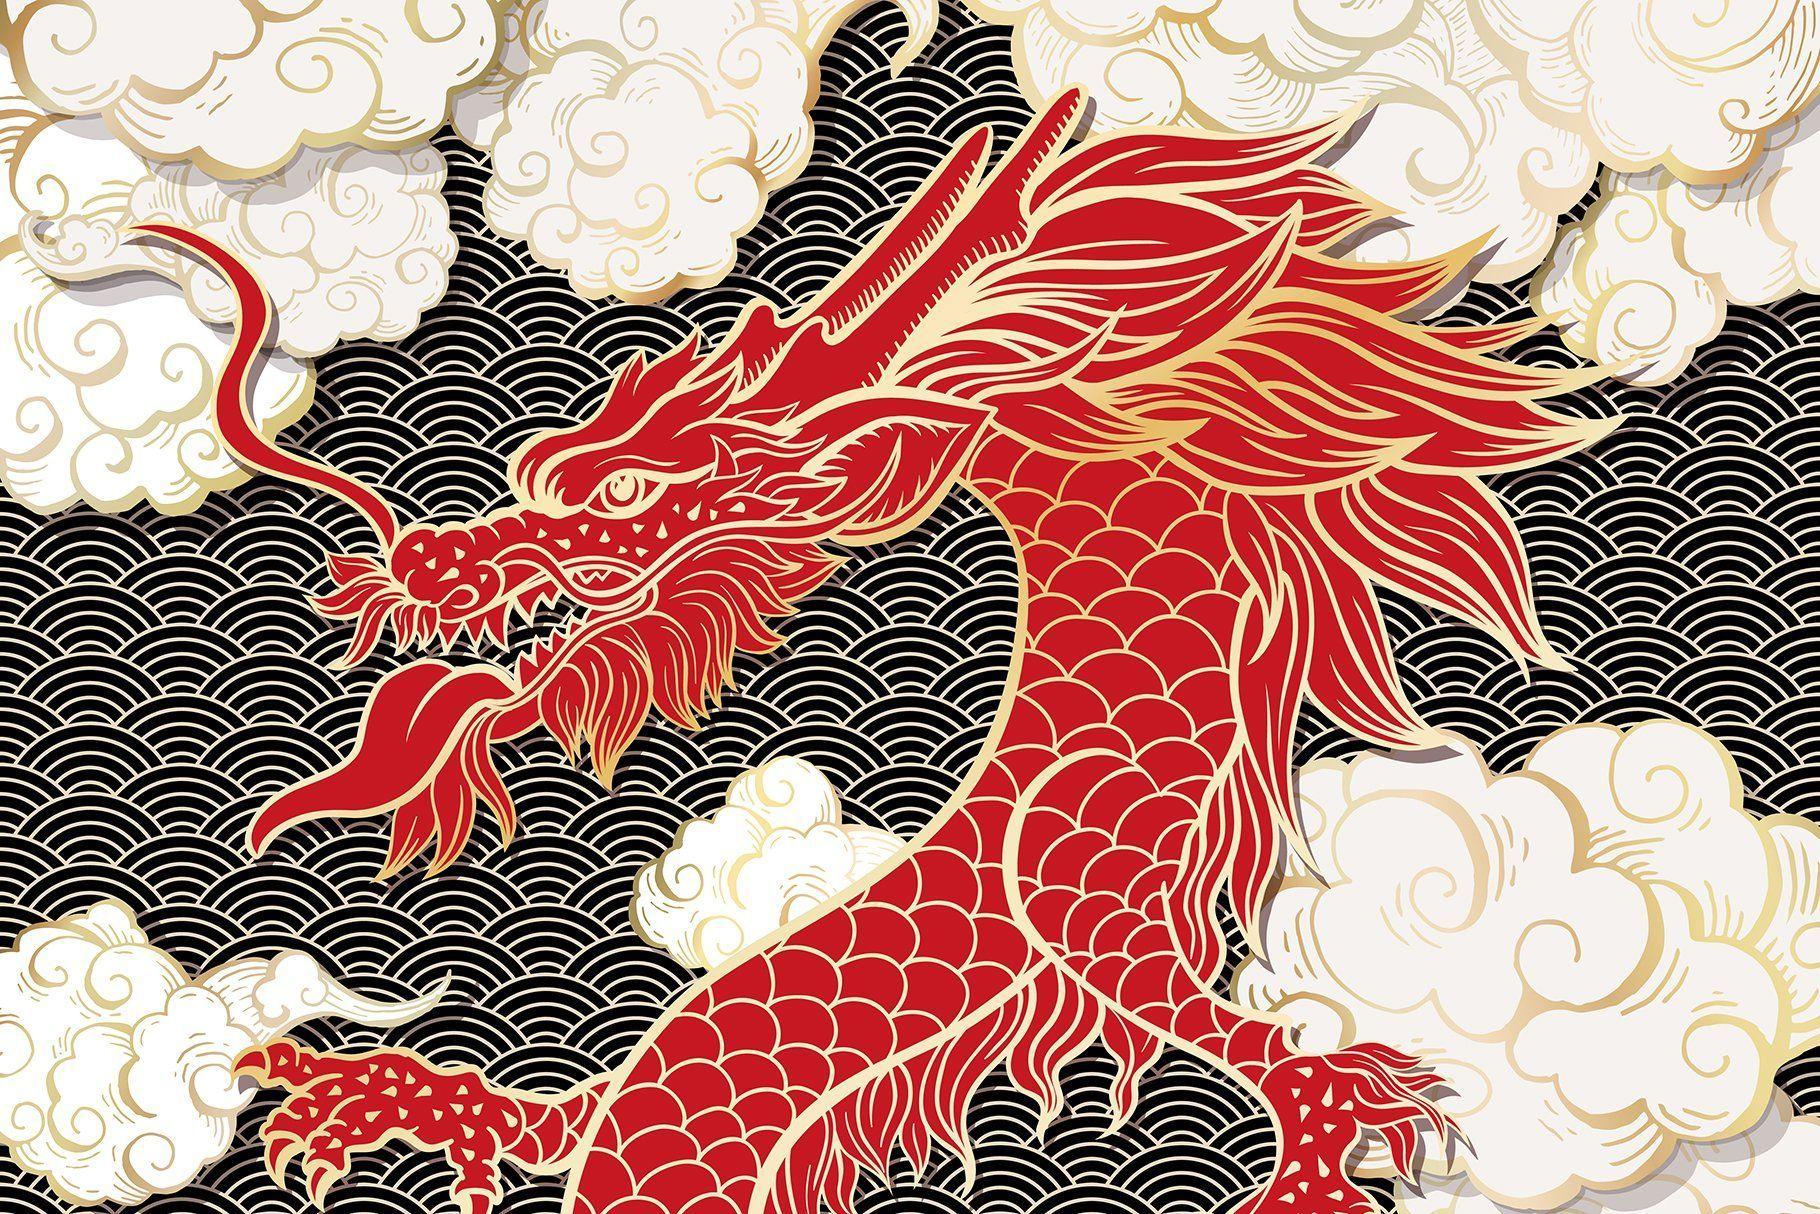 Chinese Dragon Vector Illustrations , #SPONSORED, #illustrations#clouds#styles#I... -  Chinese Dragon Vector Illustrations , #SPONSORED, #illustrations#clouds#styles#Include #Ad  - #arrowtattoo #bodyarttattoo #bodyillustration #Chinese #chinesedragontattoo #Dragon #hamsatattoo #ILLUSTRATIONS #illustrationscloudsstylesI #minertattoo #orcatattoo #SPONSORED #targaryentattoo #tattoominimalist #vector